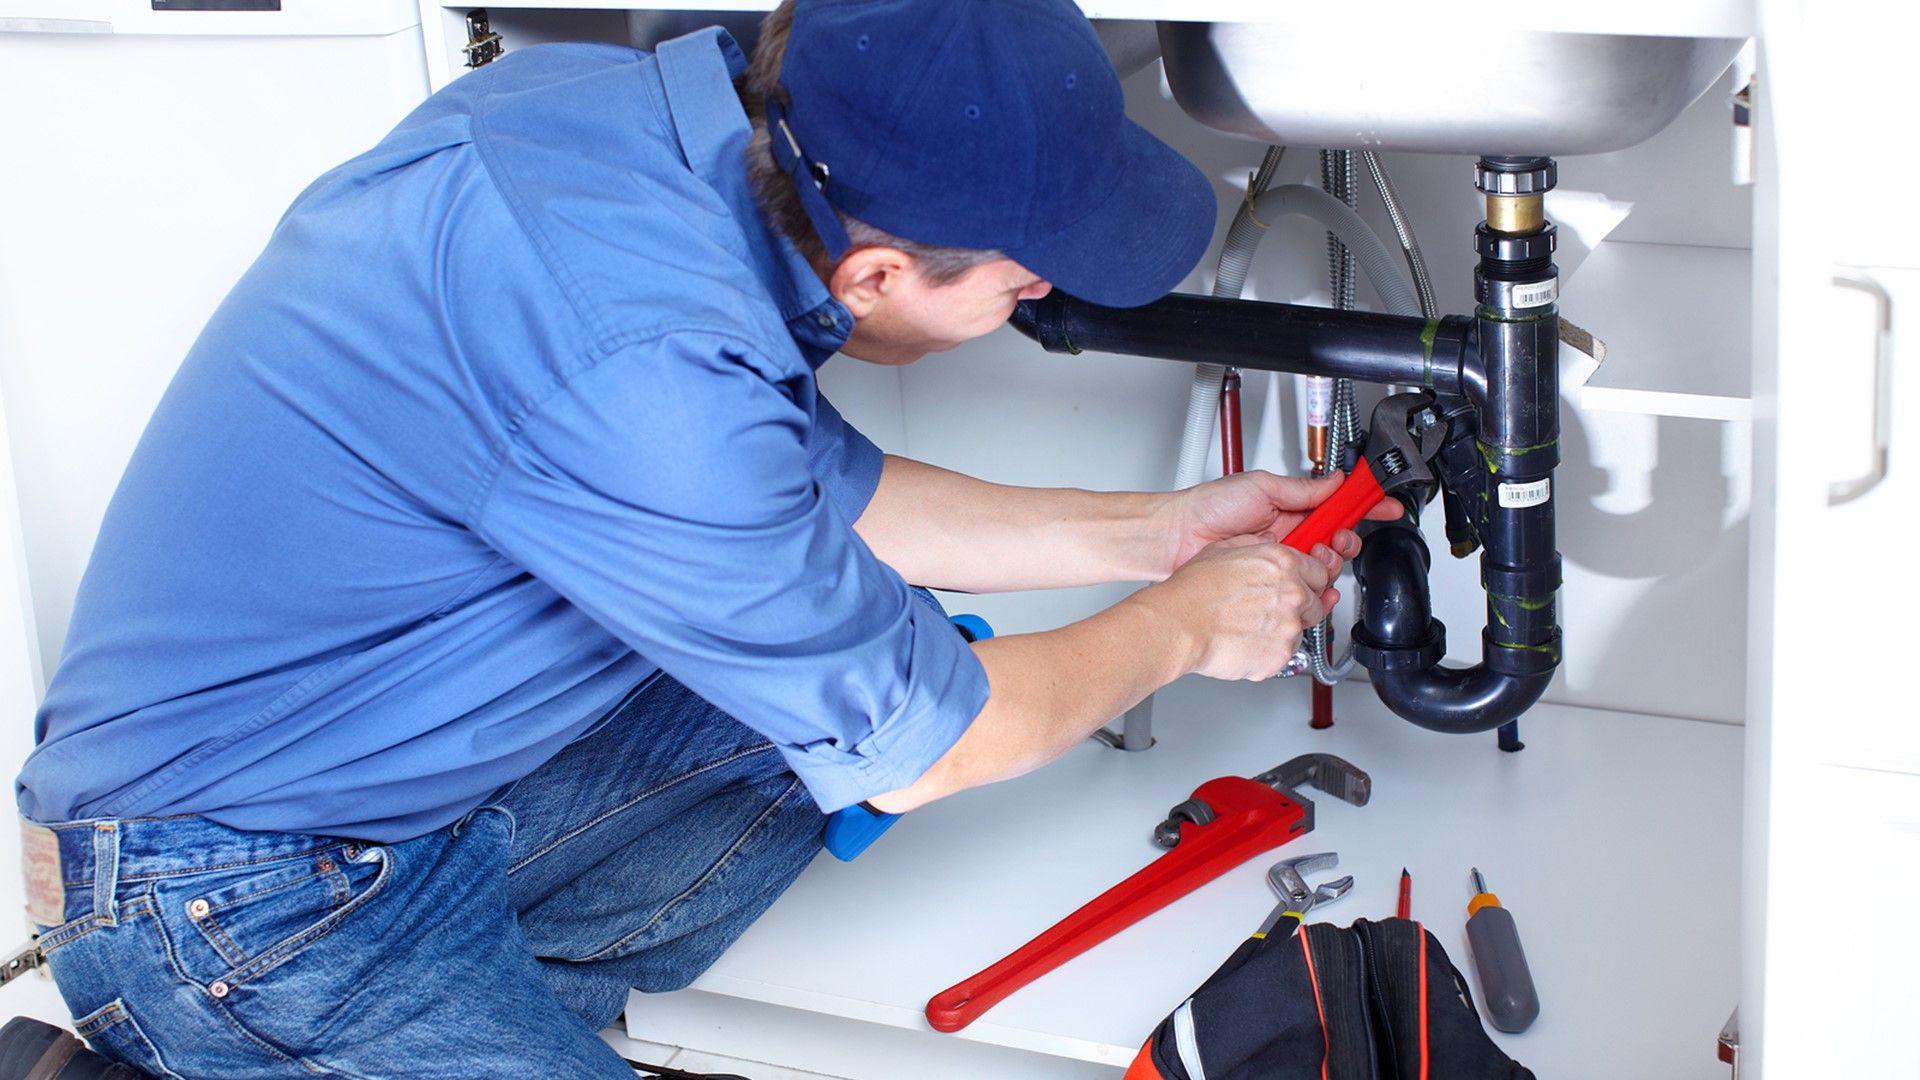 Guru Service Group Surrey Plumbing Emergency Plumbing Problems Commercial Plumbing